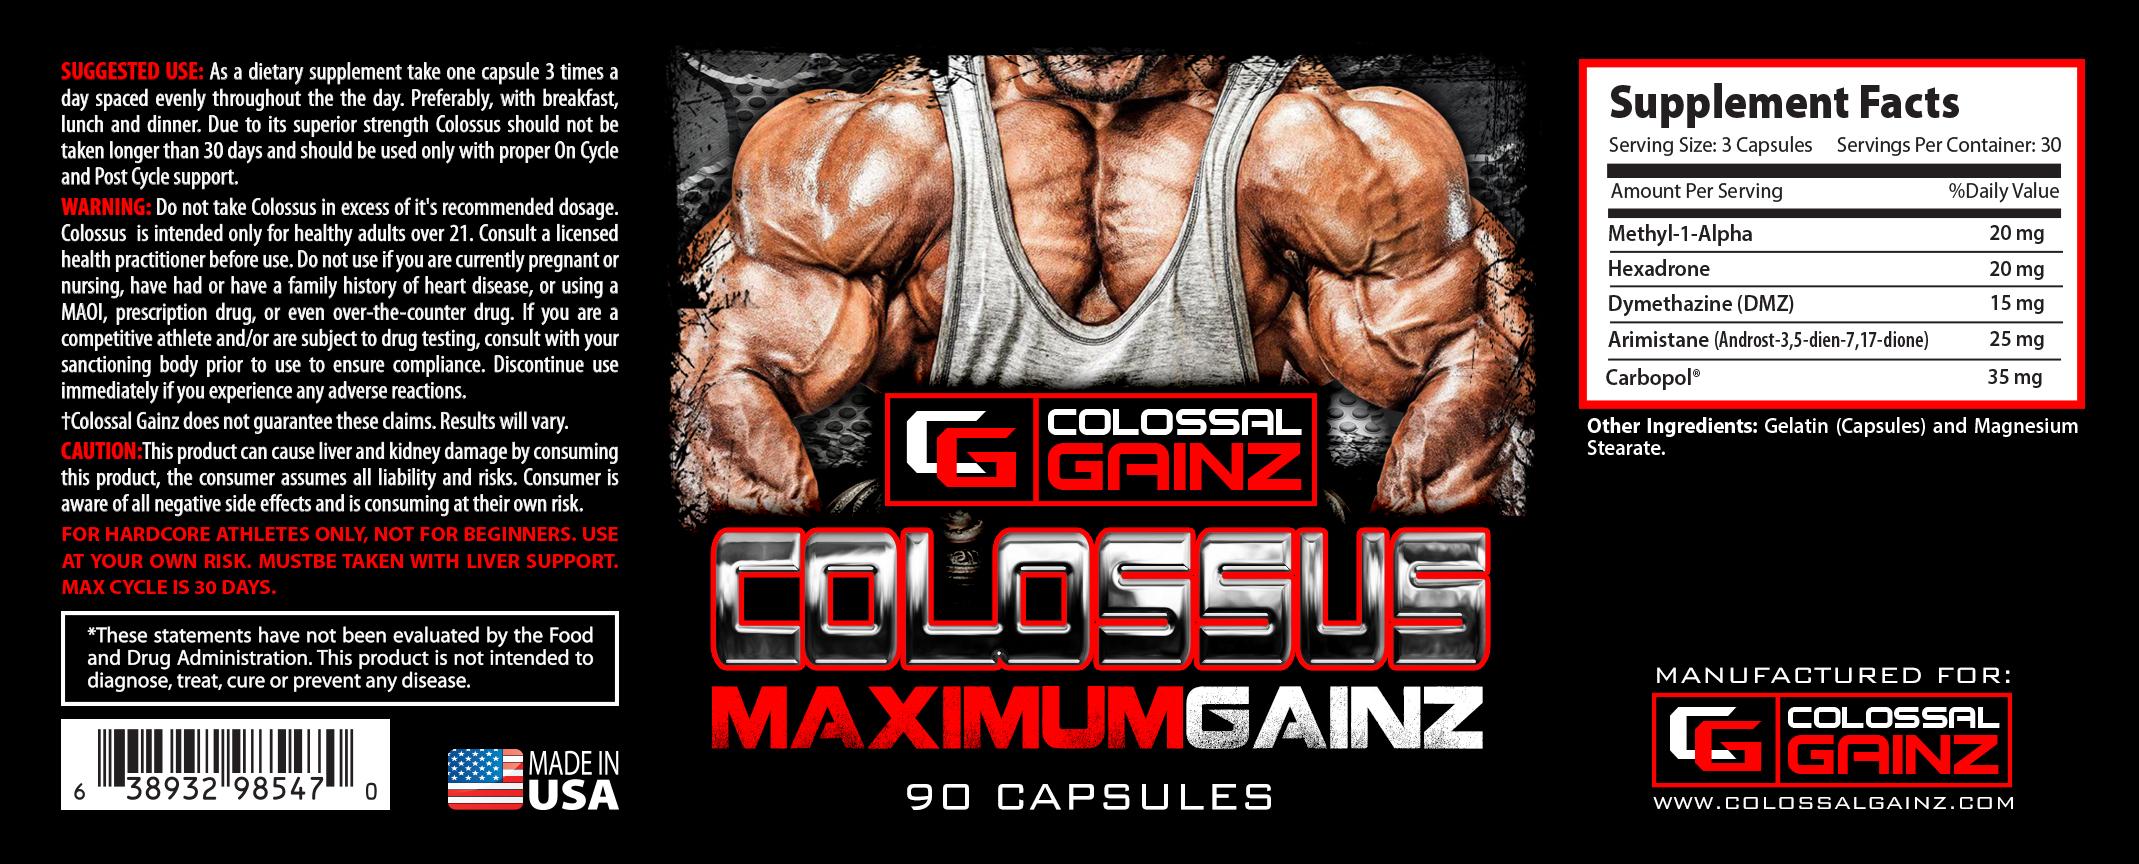 Colossus Label